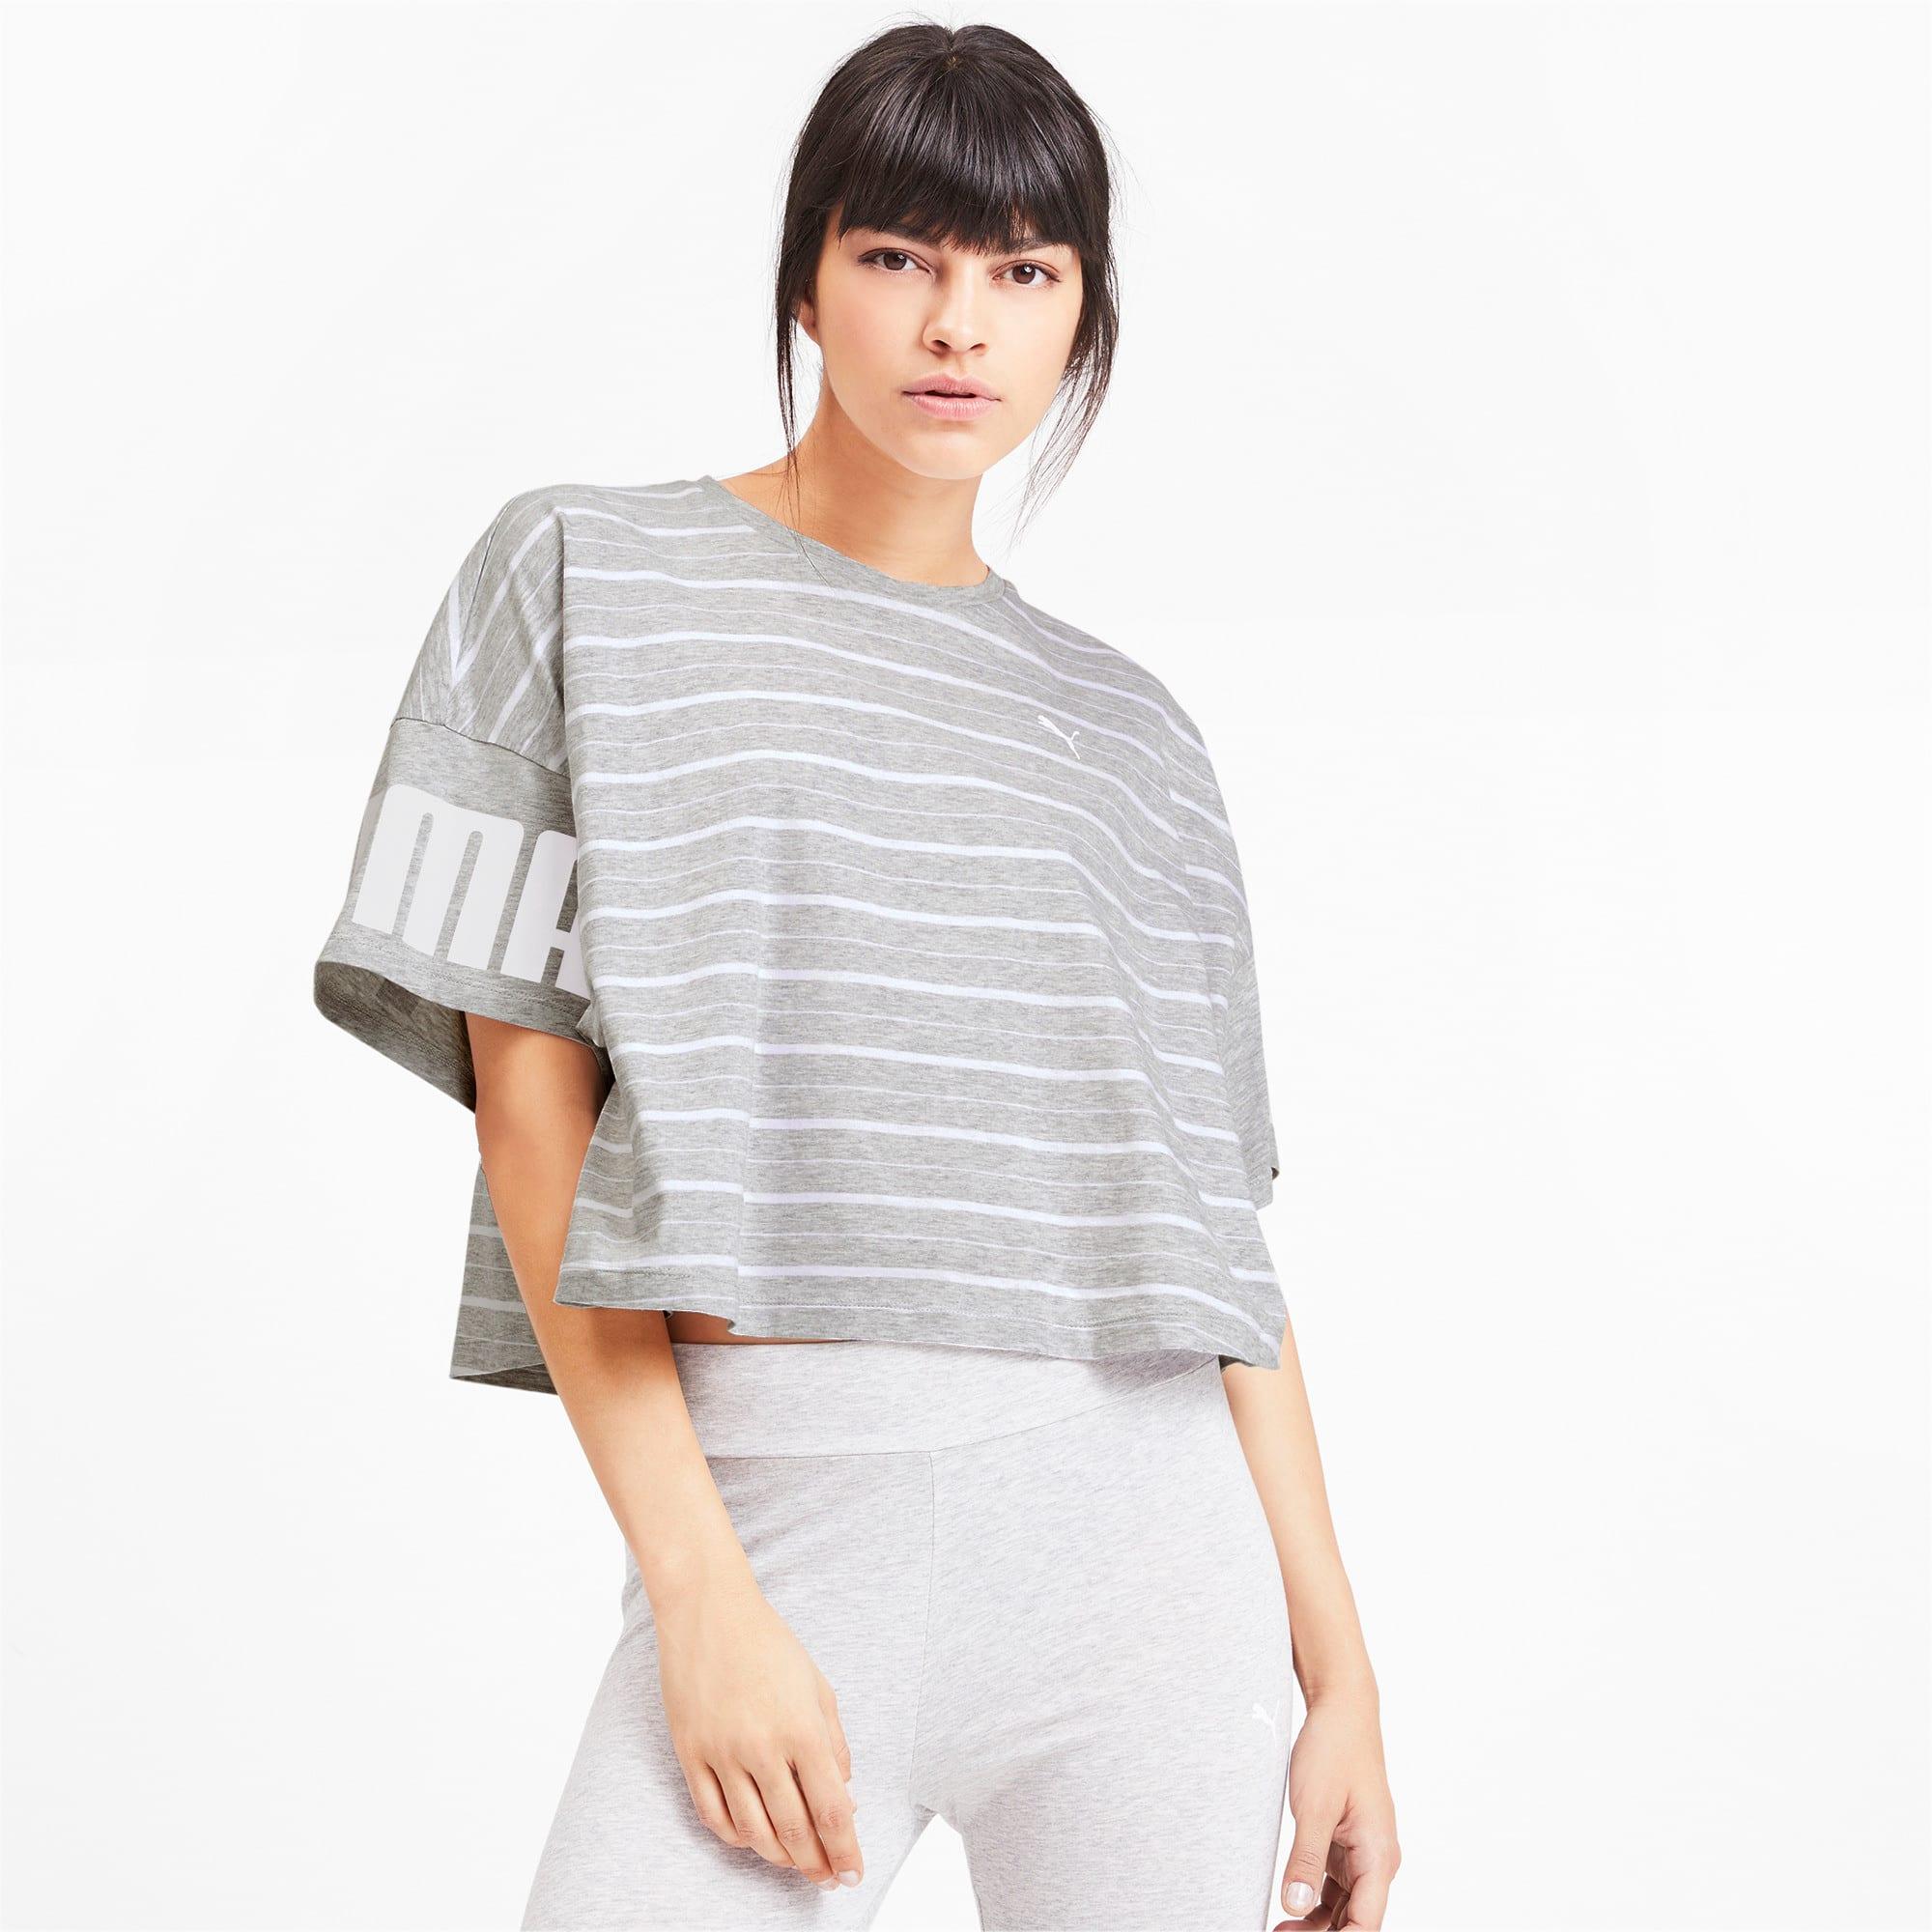 Thumbnail 2 of Rebel Striped Short Sleeve Women's Tee, Light Gray Heather, medium-IND